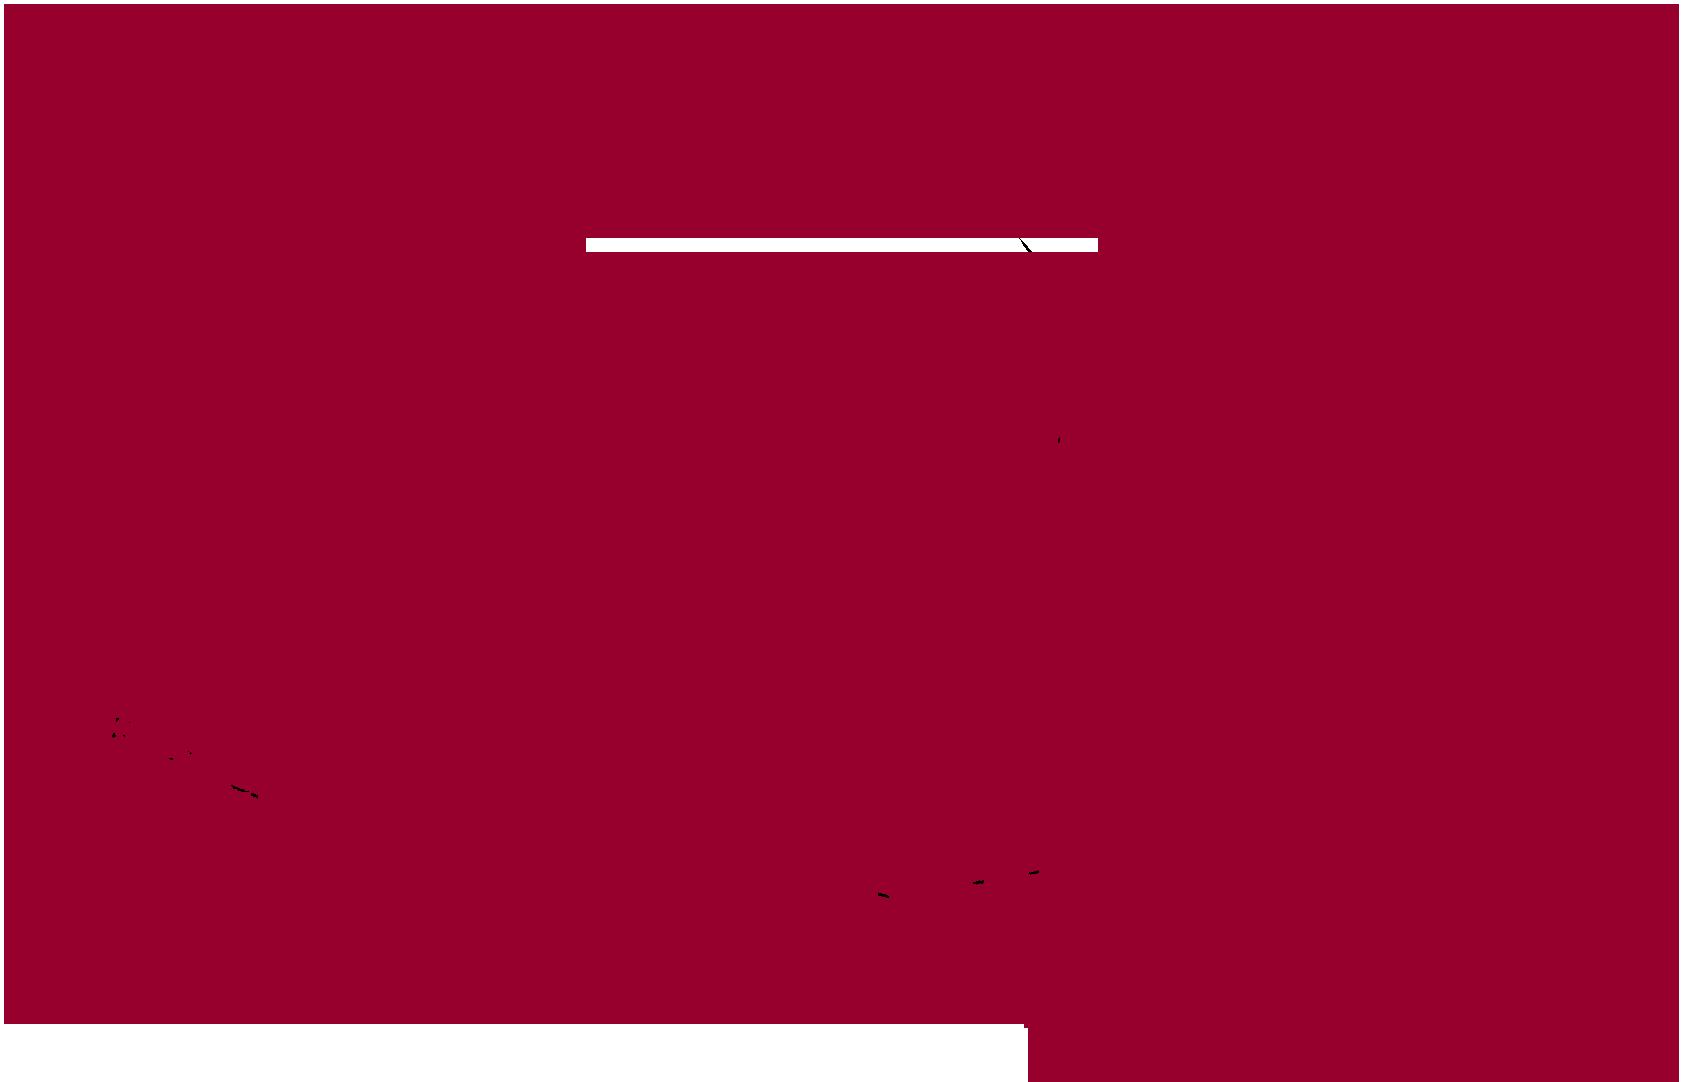 "<p>Email</p> <a href=""mailto:steelecreativity@gmail.com><p style=""letter-spacing:1px;"">steelecreativity</p><p>@gmail.com</p></a>"